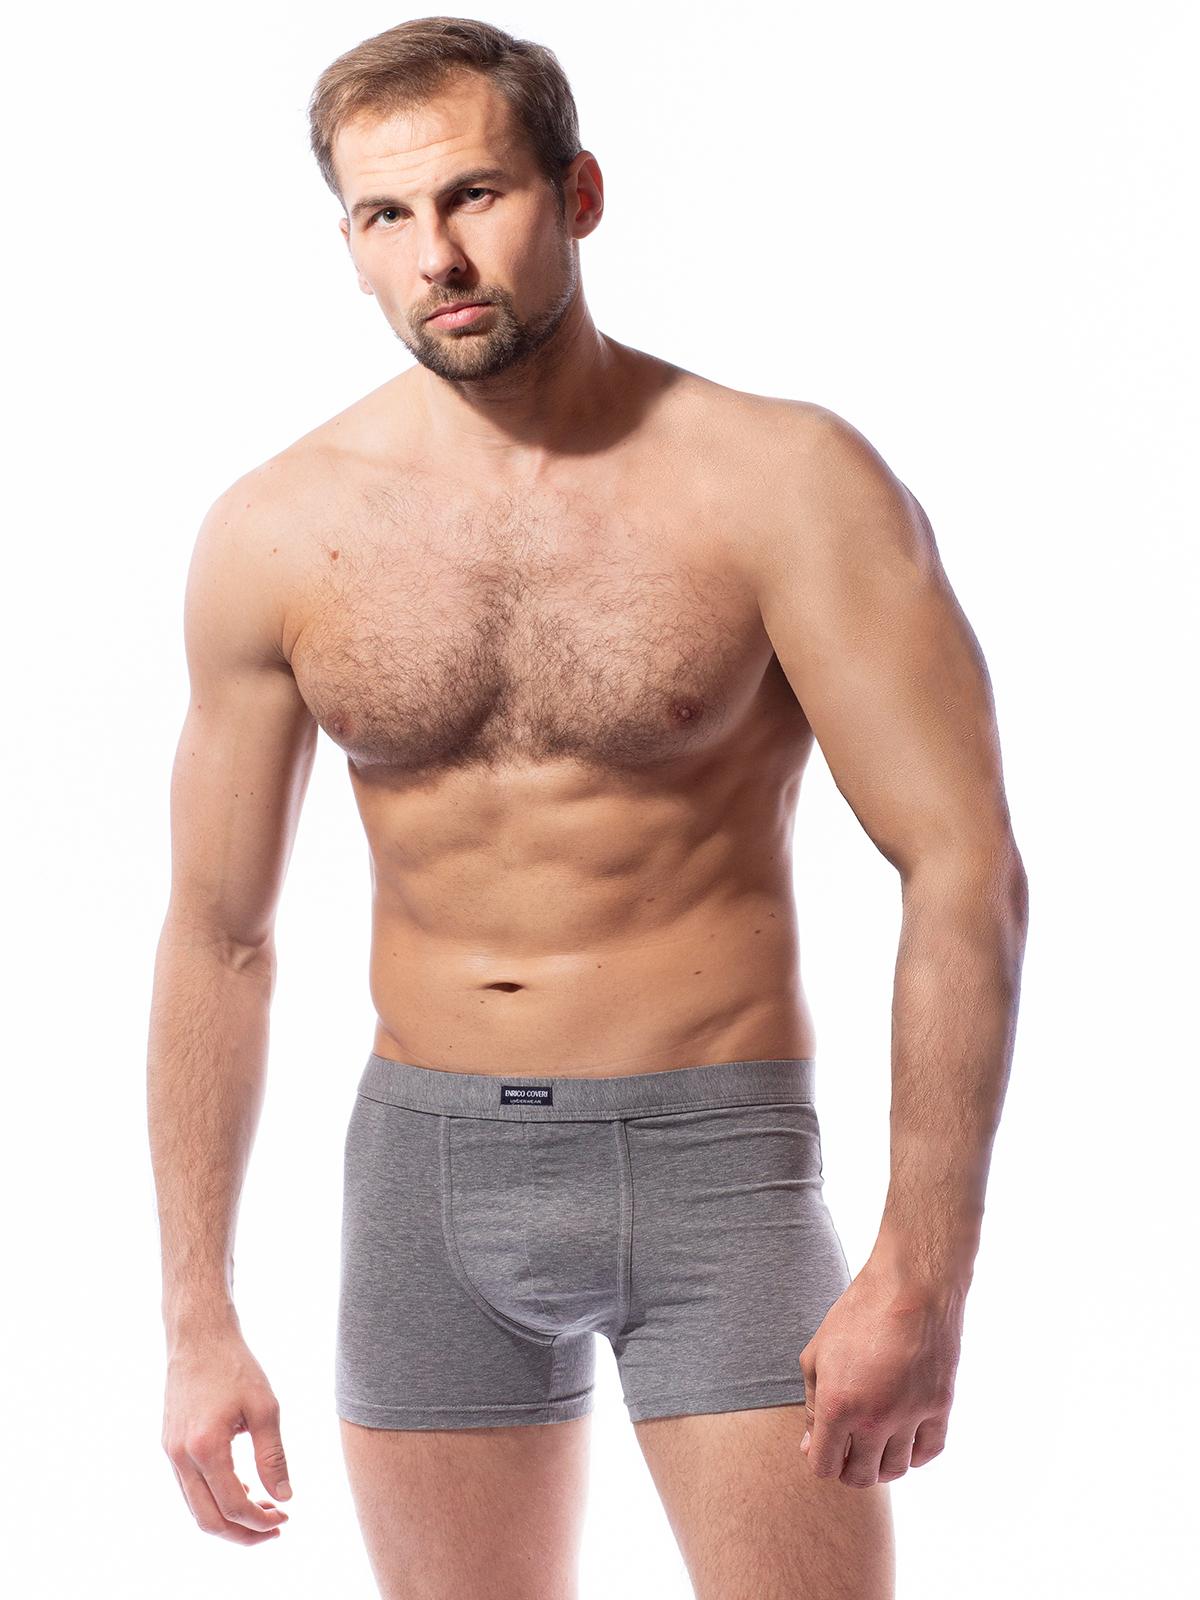 Трусы боксеры мужские Enrico Coveri серые XL